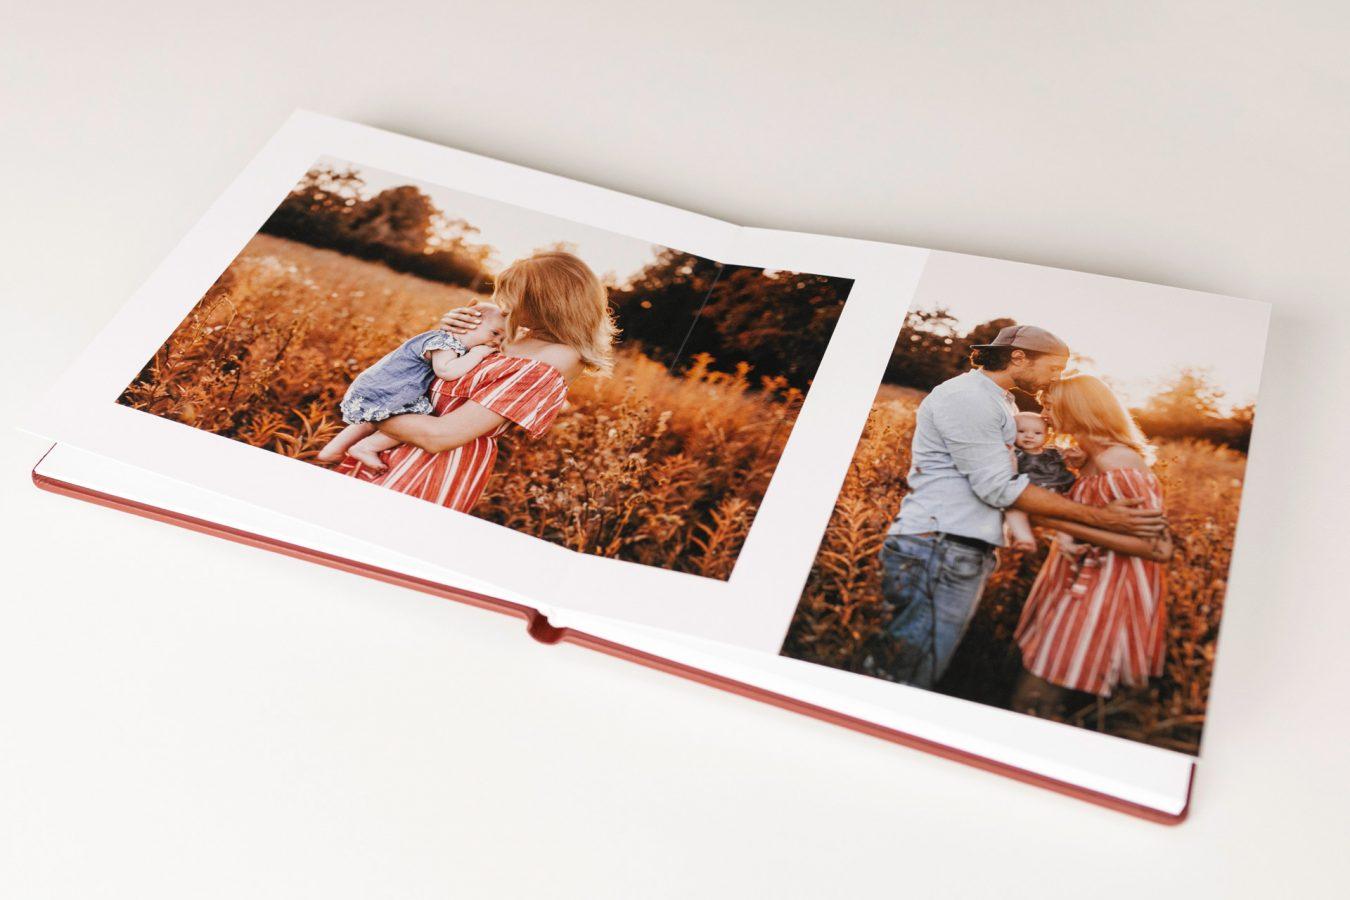 Fotoalbum Familienfotos Familienfotografie Ledereinband nPhoto